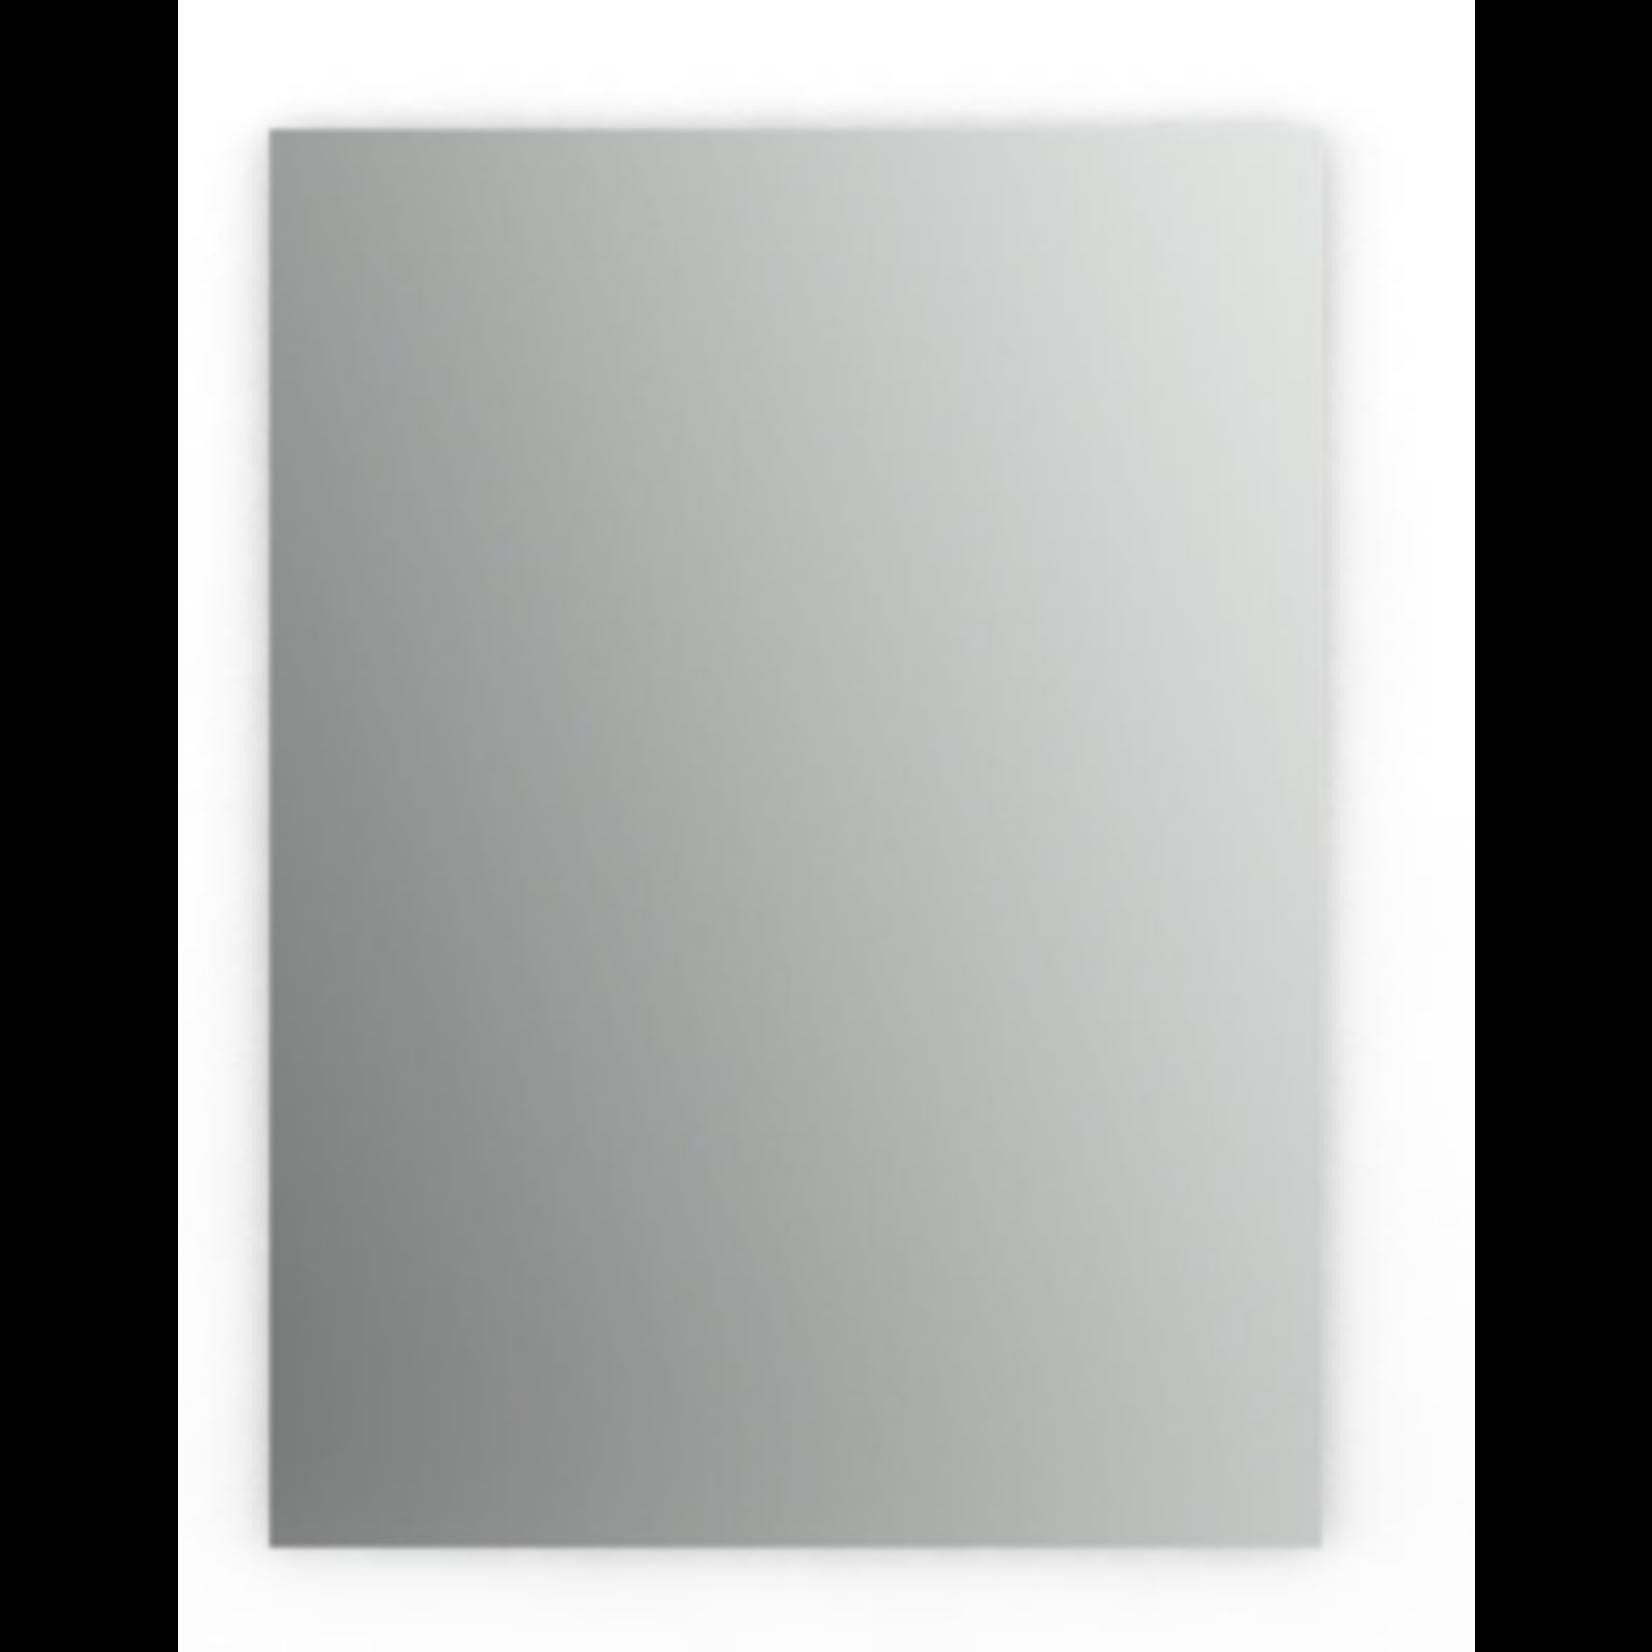 9211 Delta Frameless Rectangular Bathroom Vanity Mirror